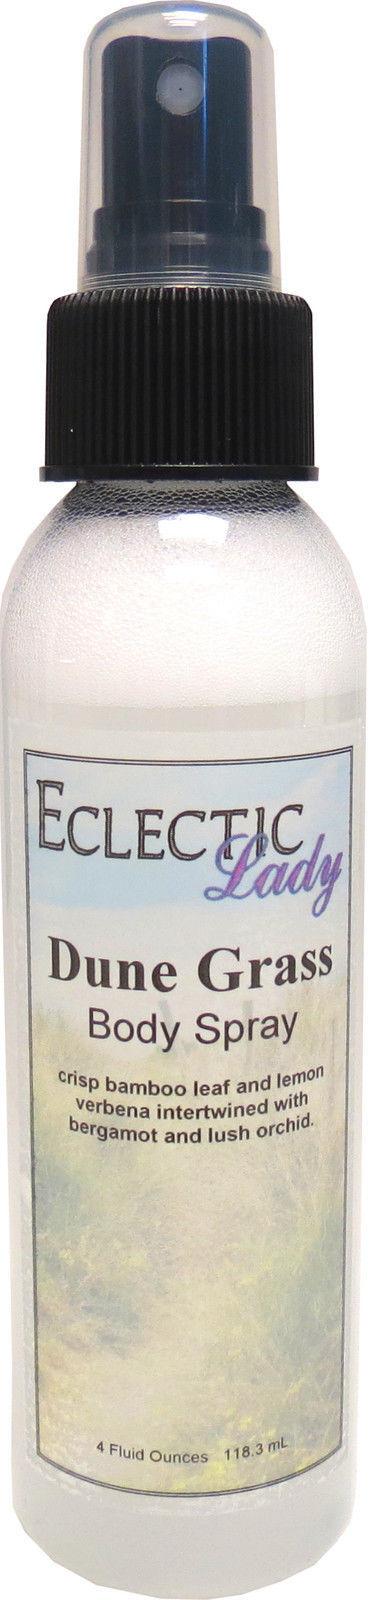 Dune Grass Body Spray